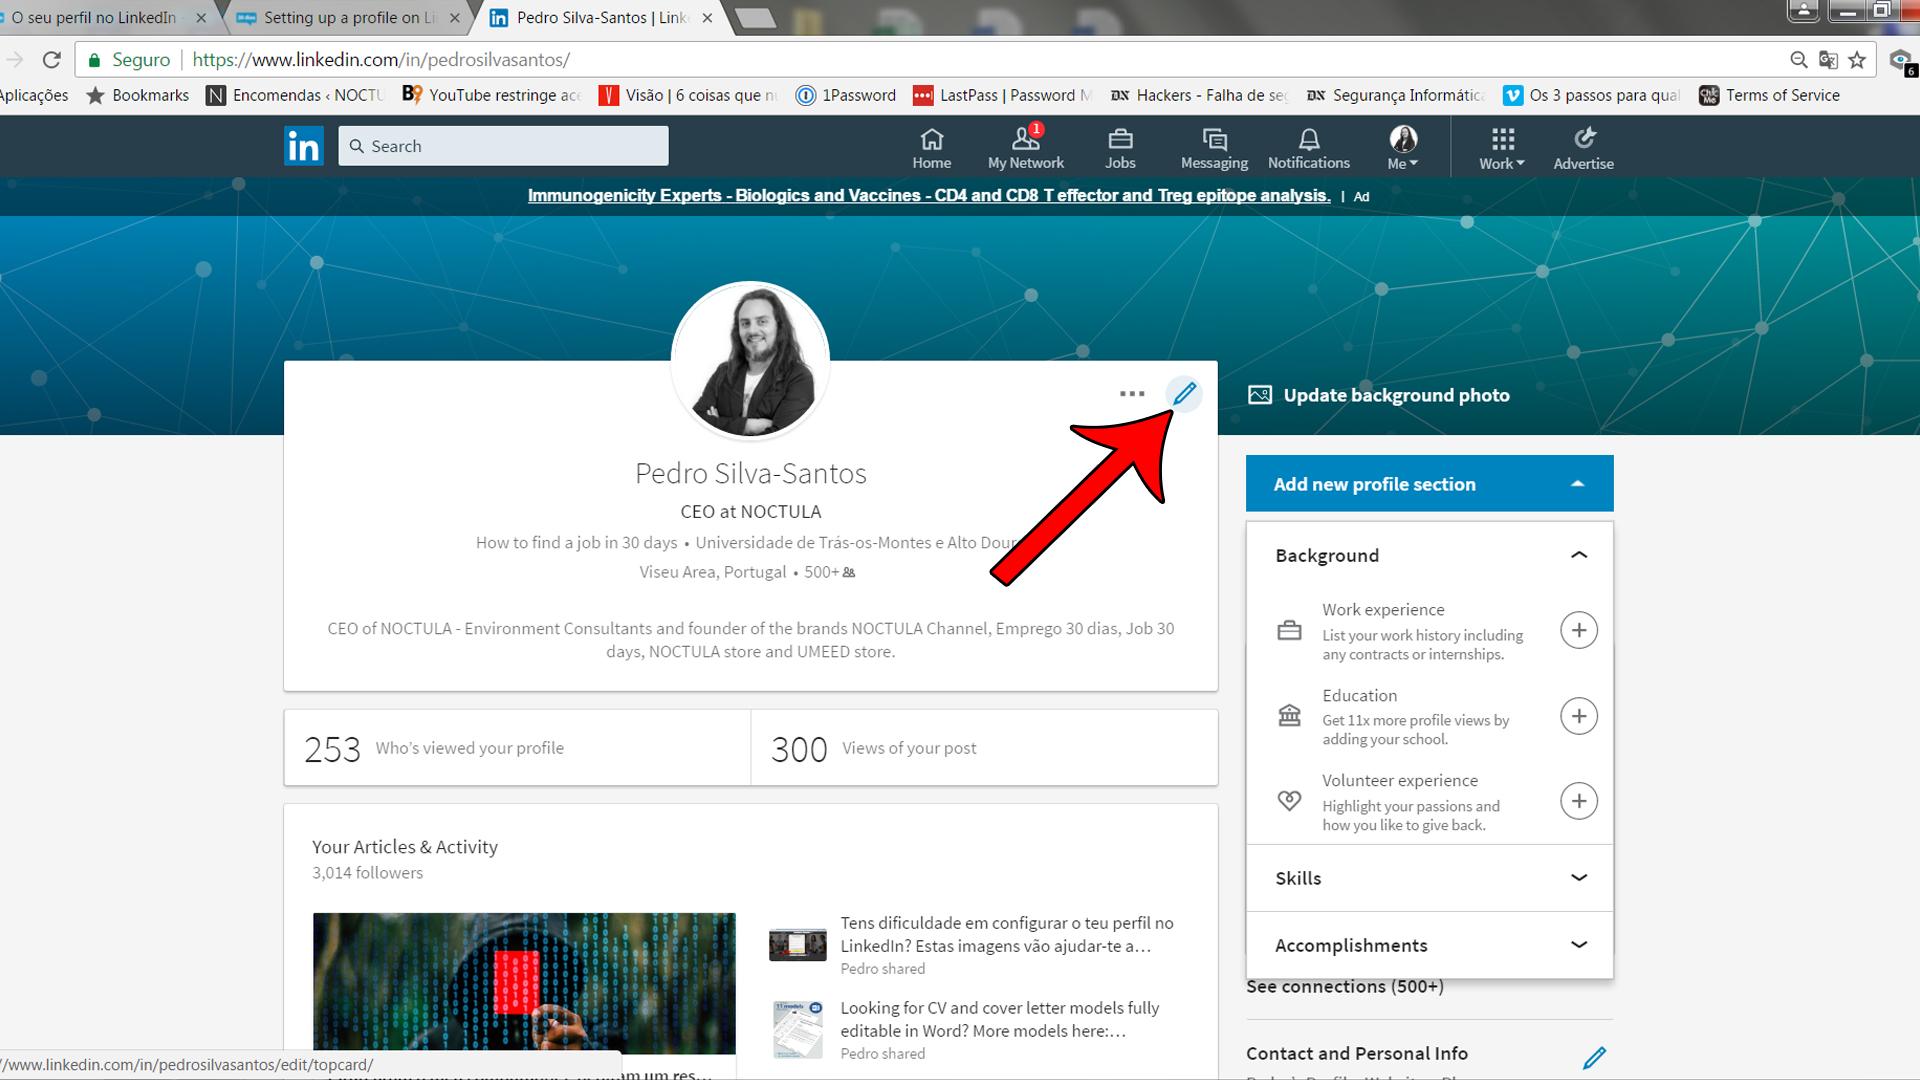 Setting up a profile on LinkedIn_02